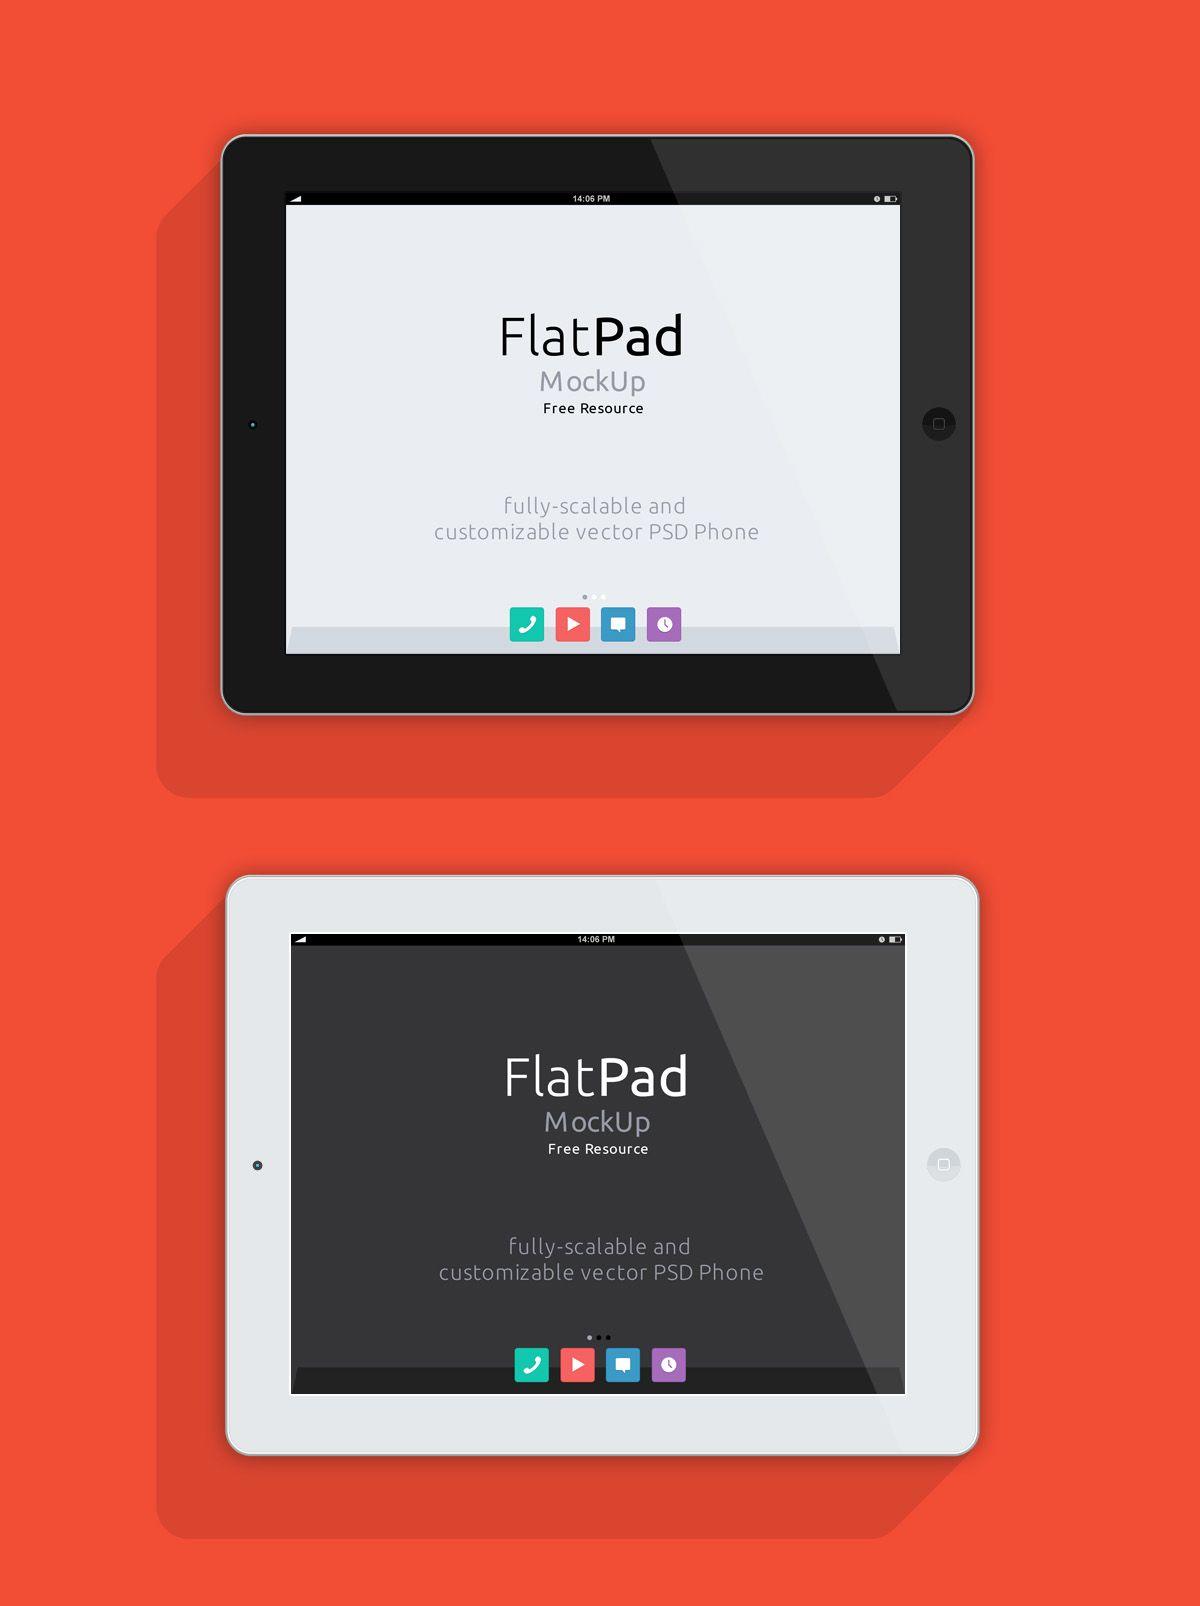 iPad Flat Mock-Up - Landscape (PSD) | Free landscape ...